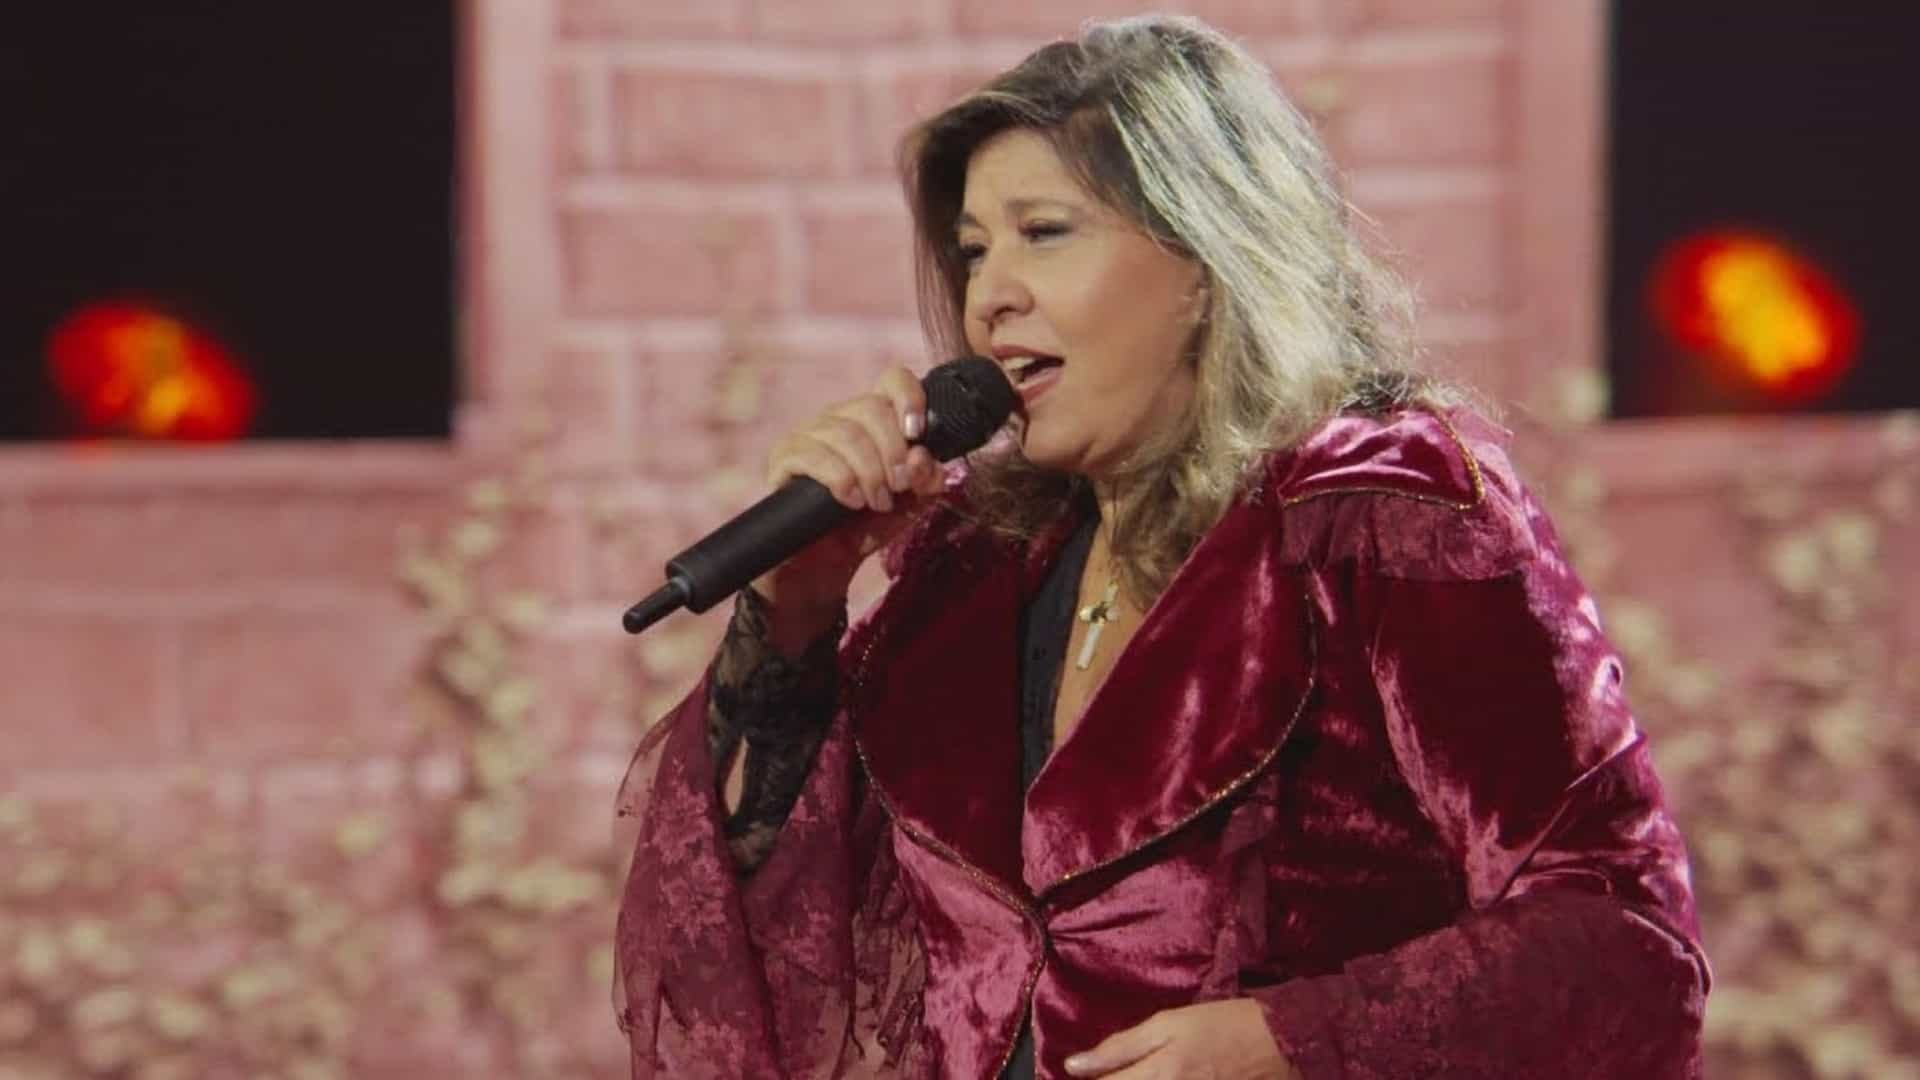 Roberta Miranda diz que foi maltratada por segurança de Gusttavo Lima